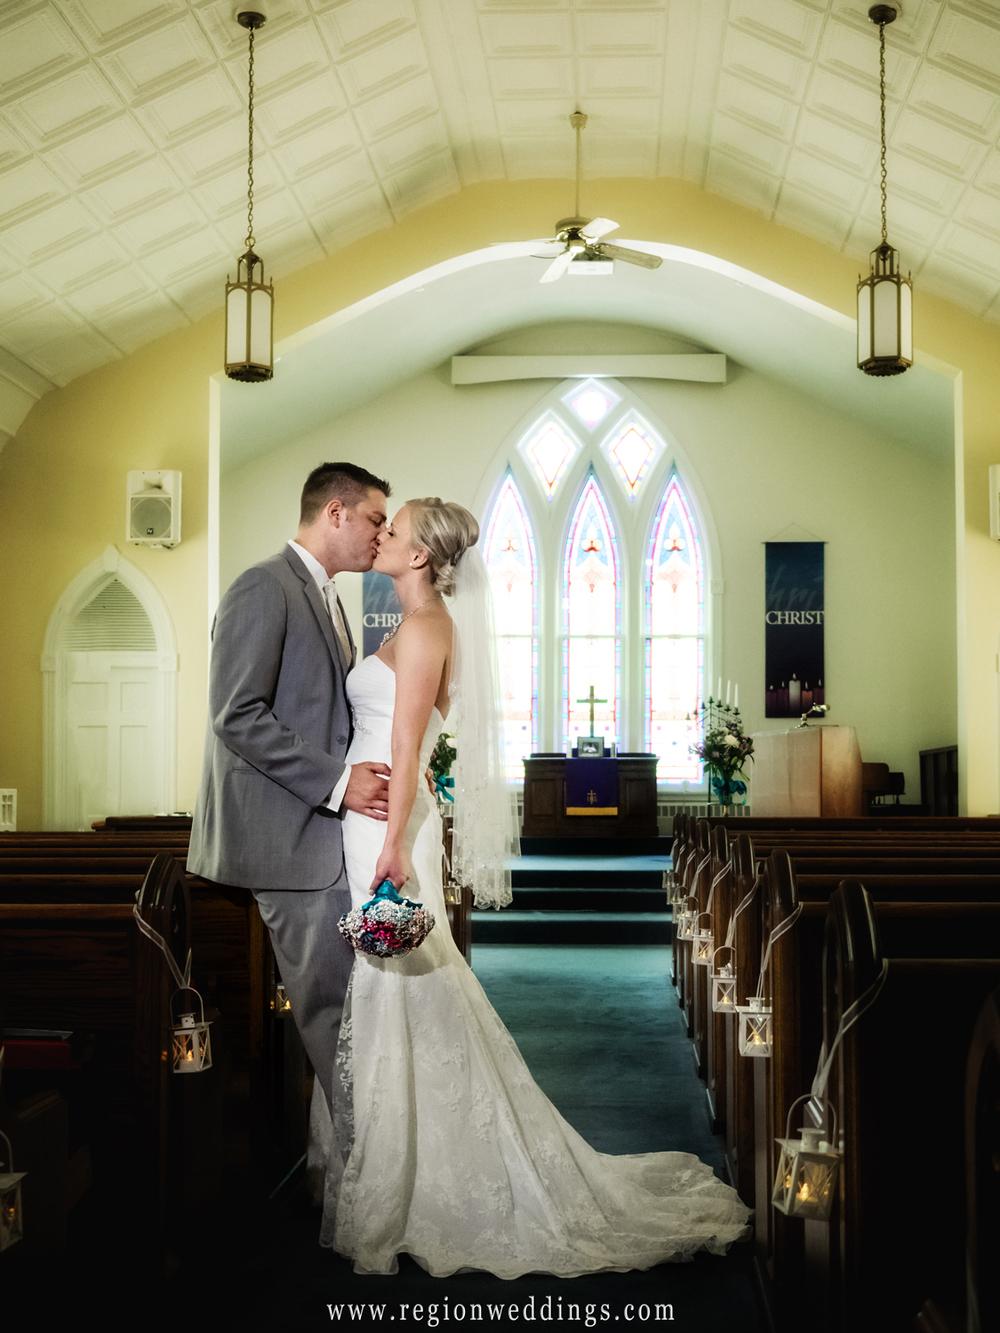 Wedding At United Methodist Church In Hebron Indiana